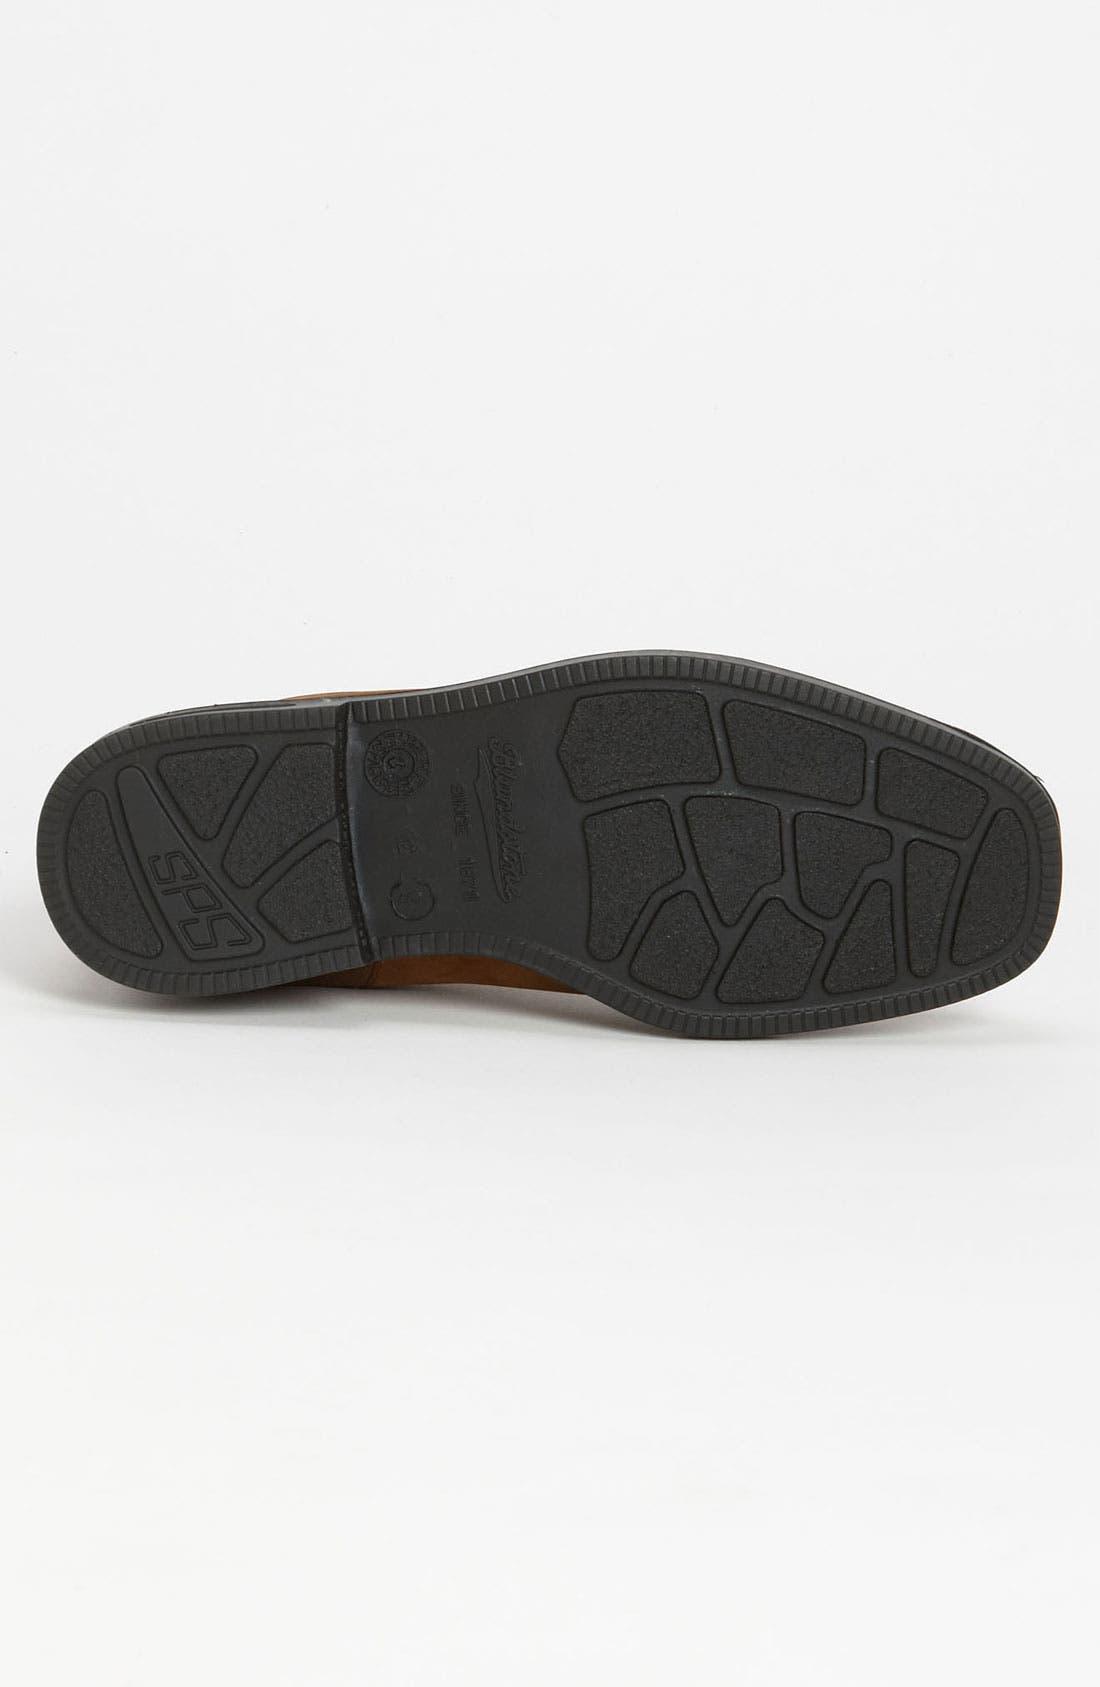 Footwear Chelsea Boot,                             Alternate thumbnail 4, color,                             Dark Brown